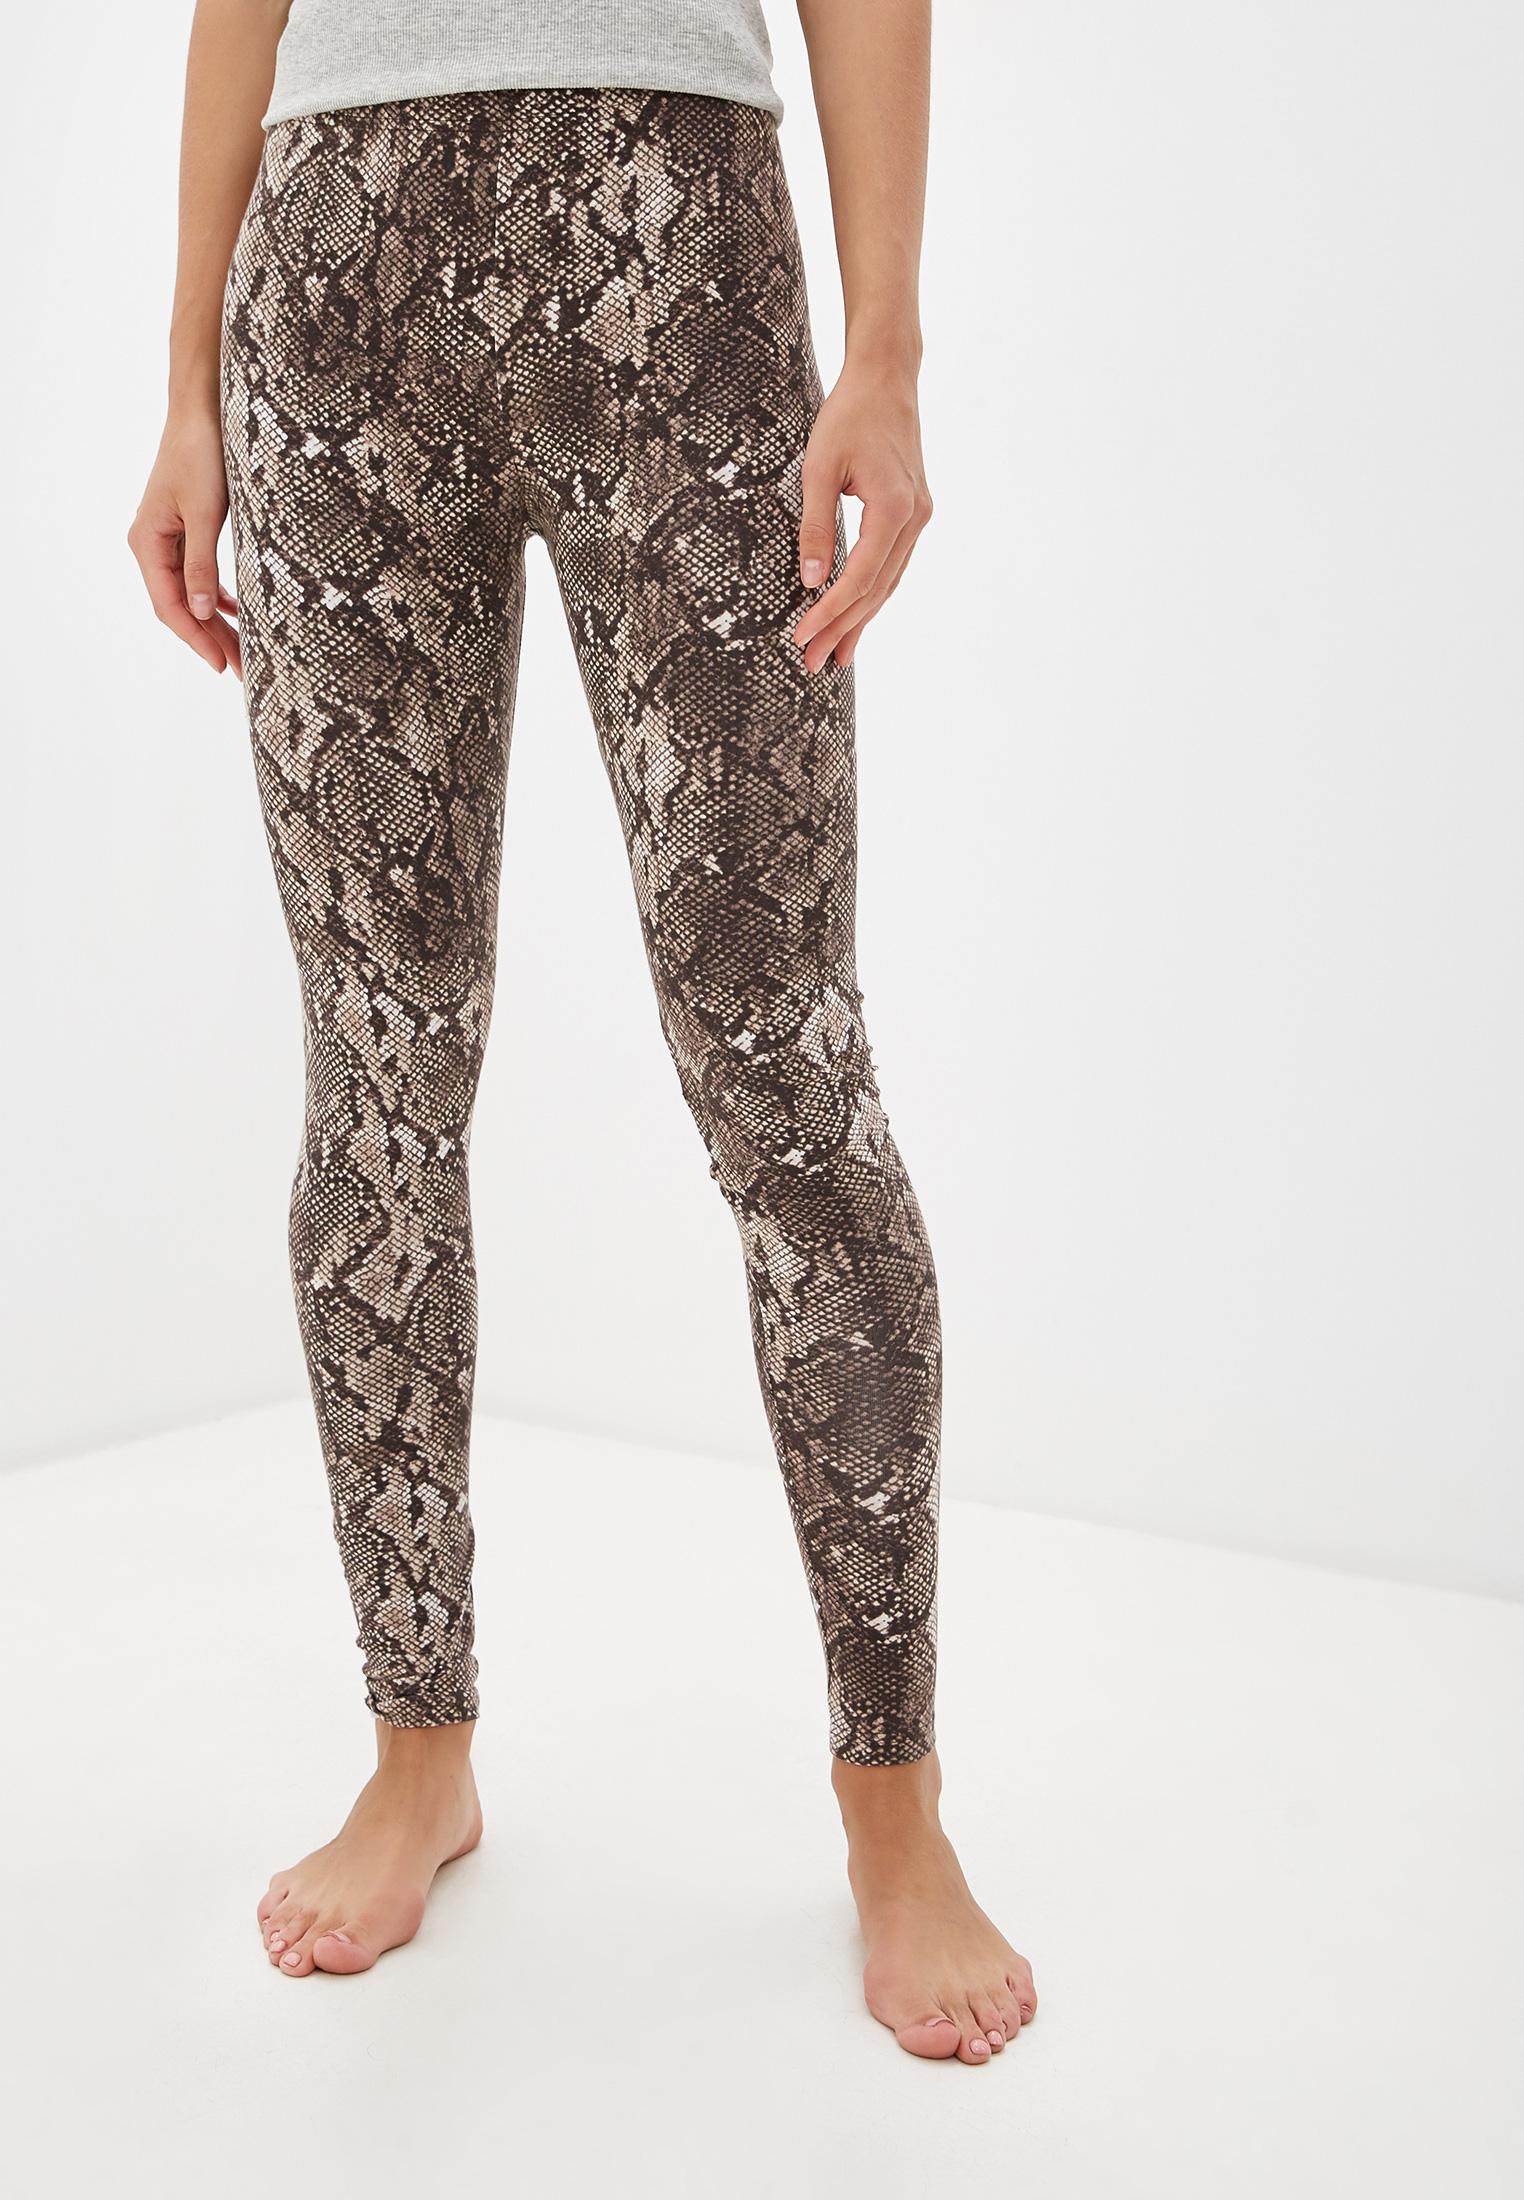 Женские домашние брюки Лори Б031-15